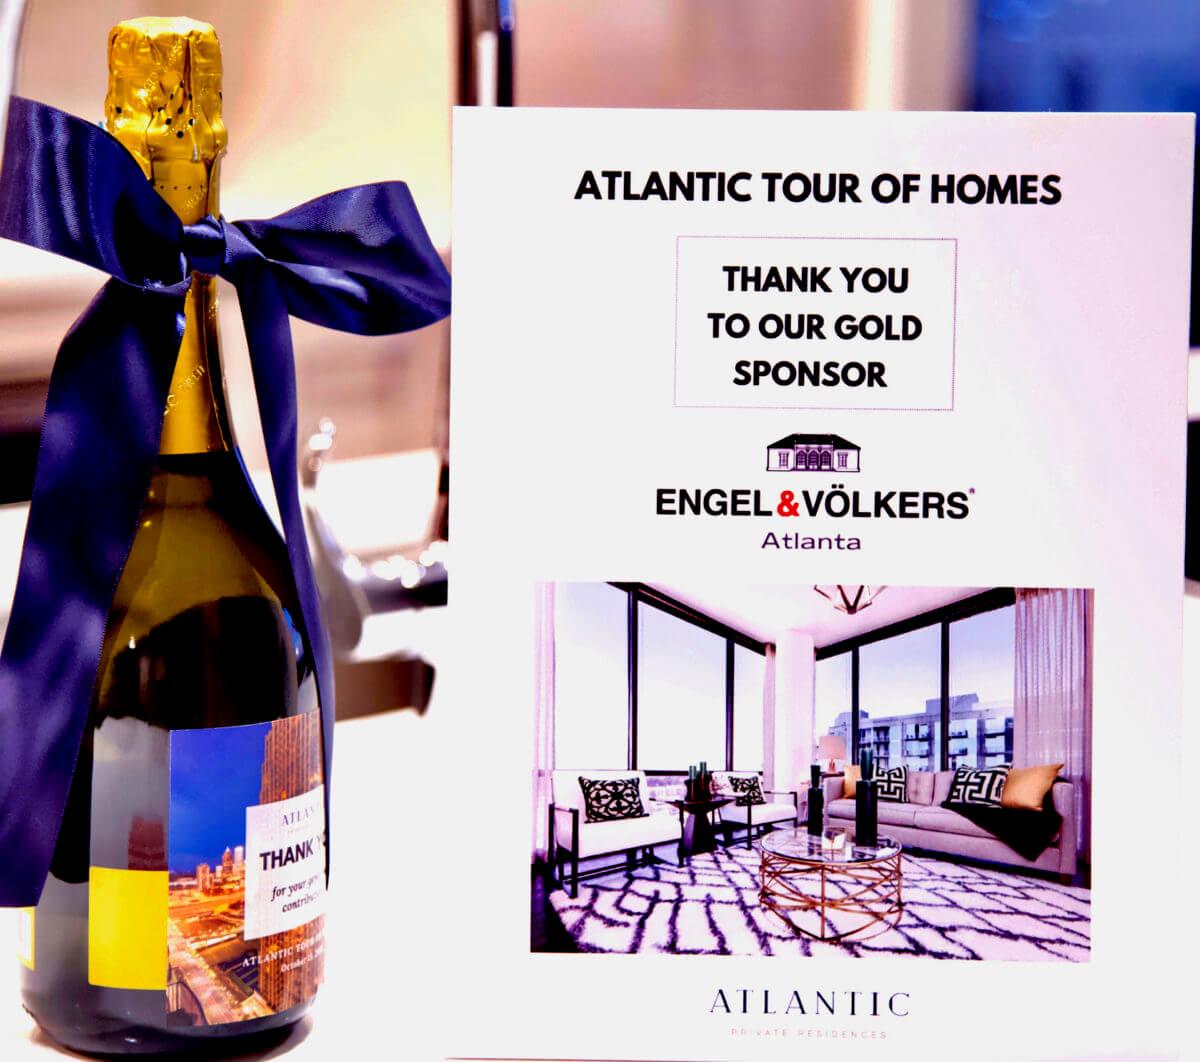 Atlantic Tour of Homes